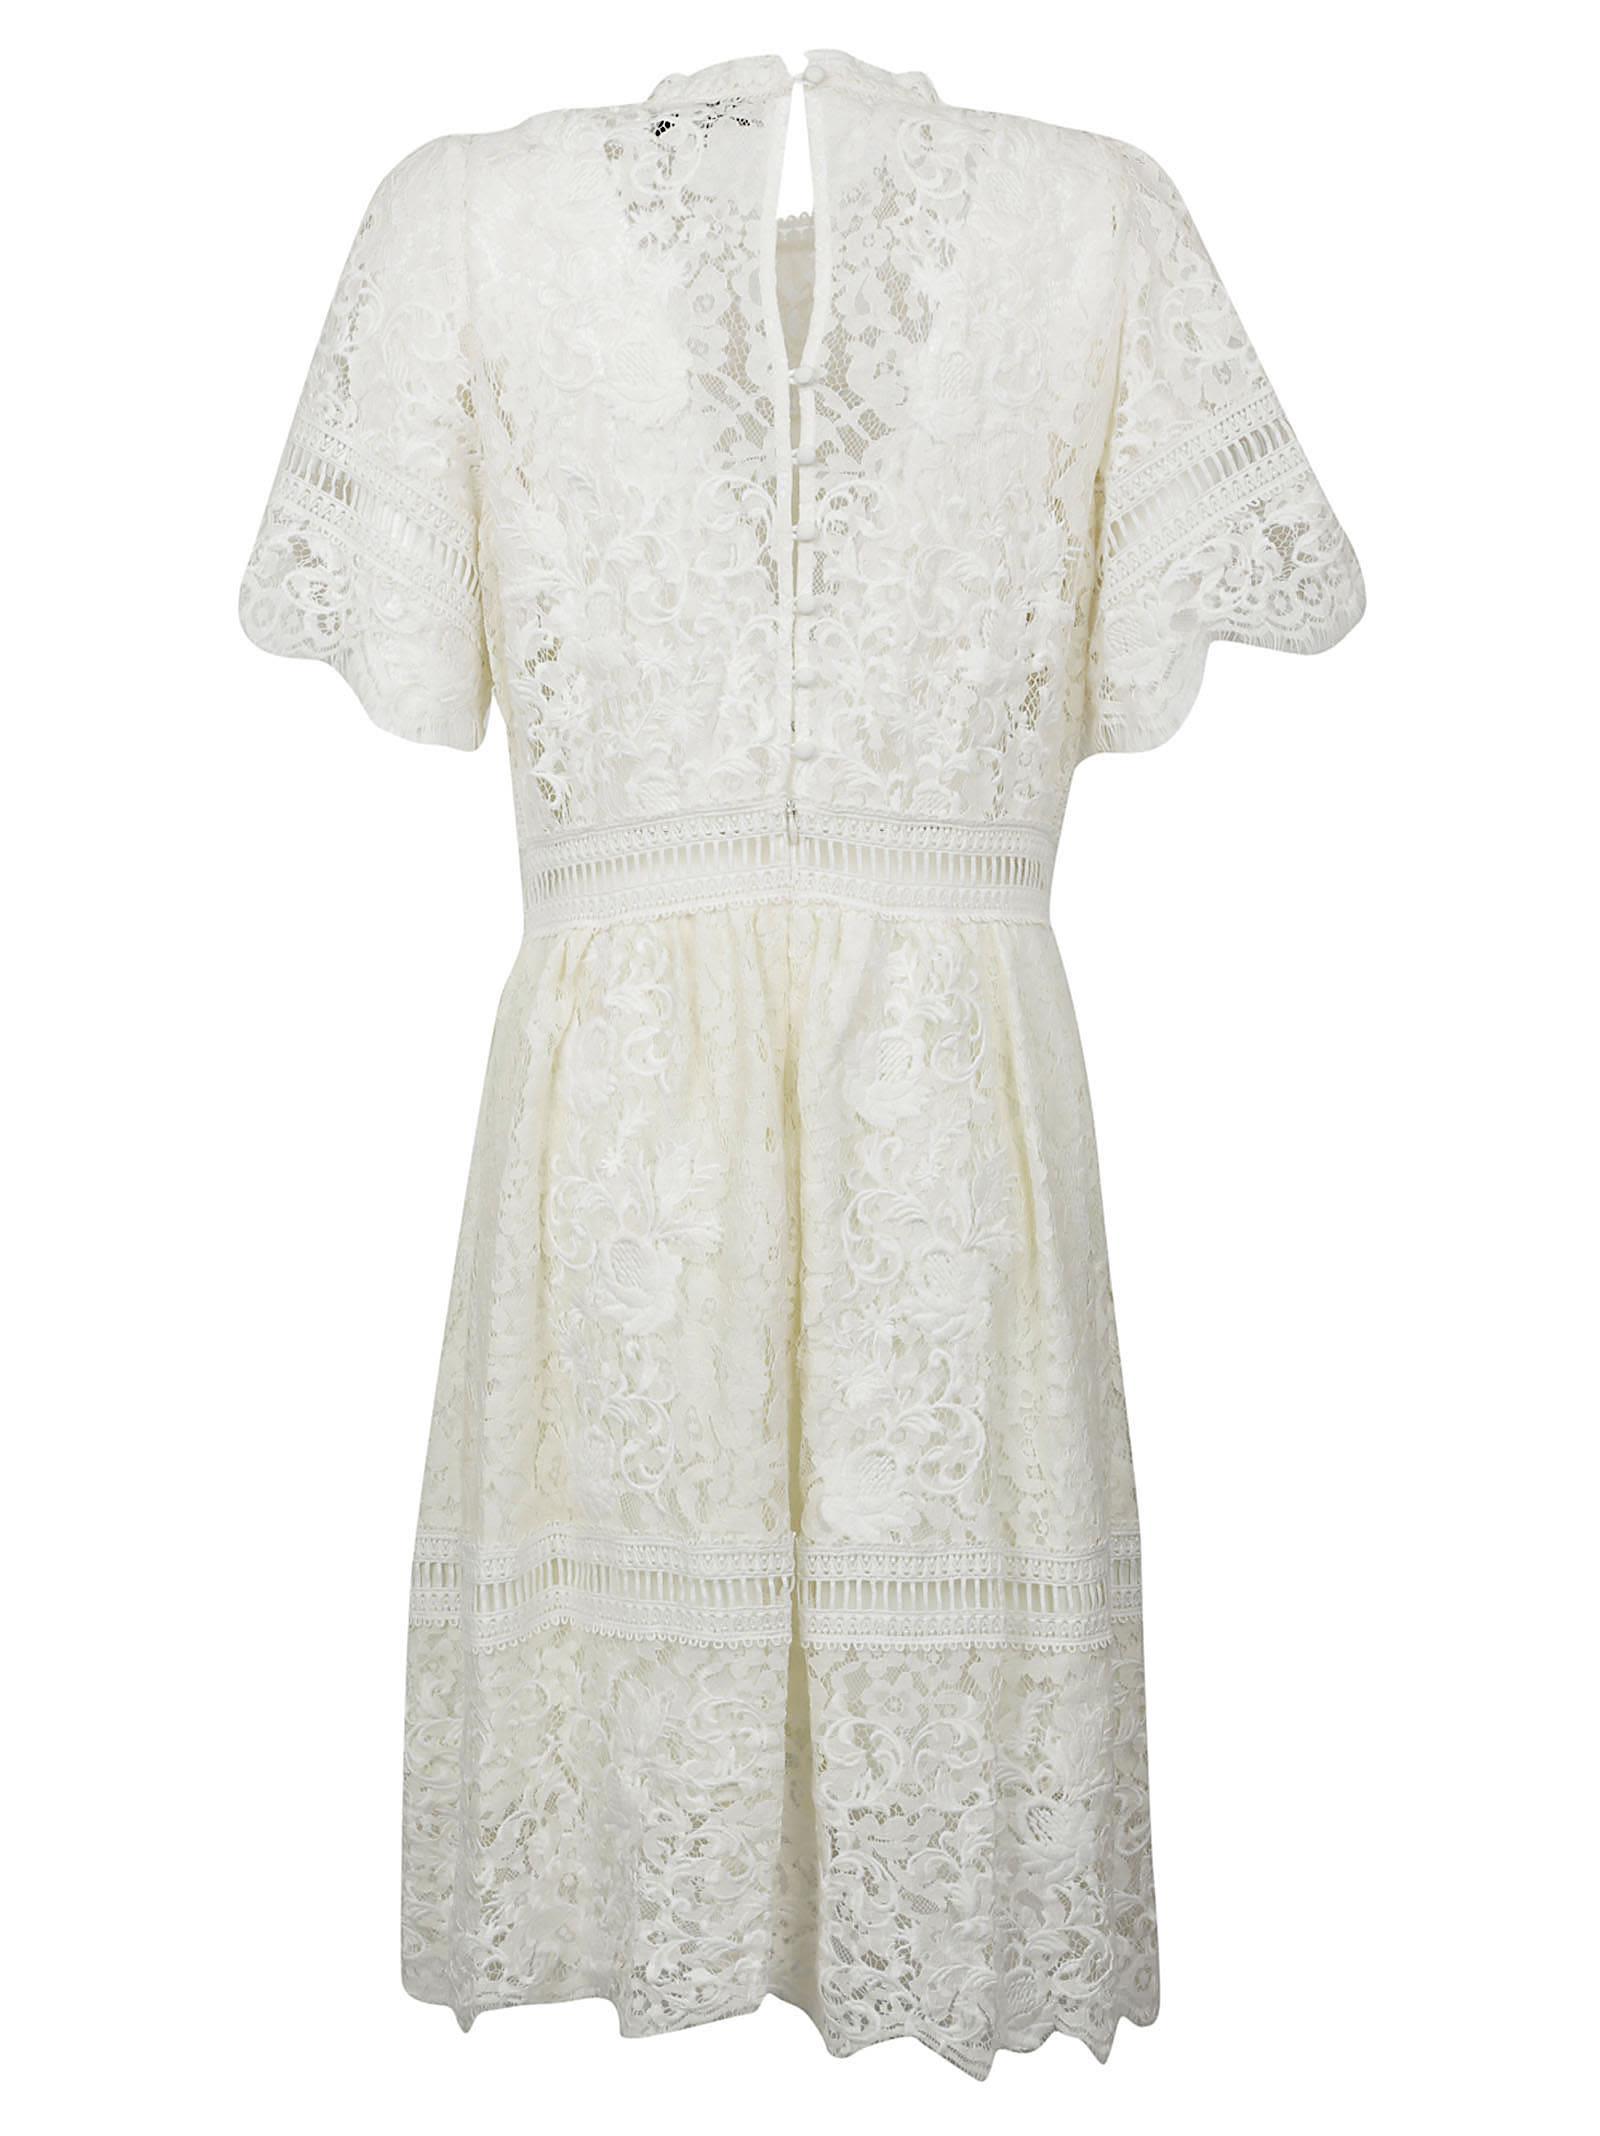 sea sea new york puff sleeved embroidered lace dress cream women 39 s dresses italist. Black Bedroom Furniture Sets. Home Design Ideas